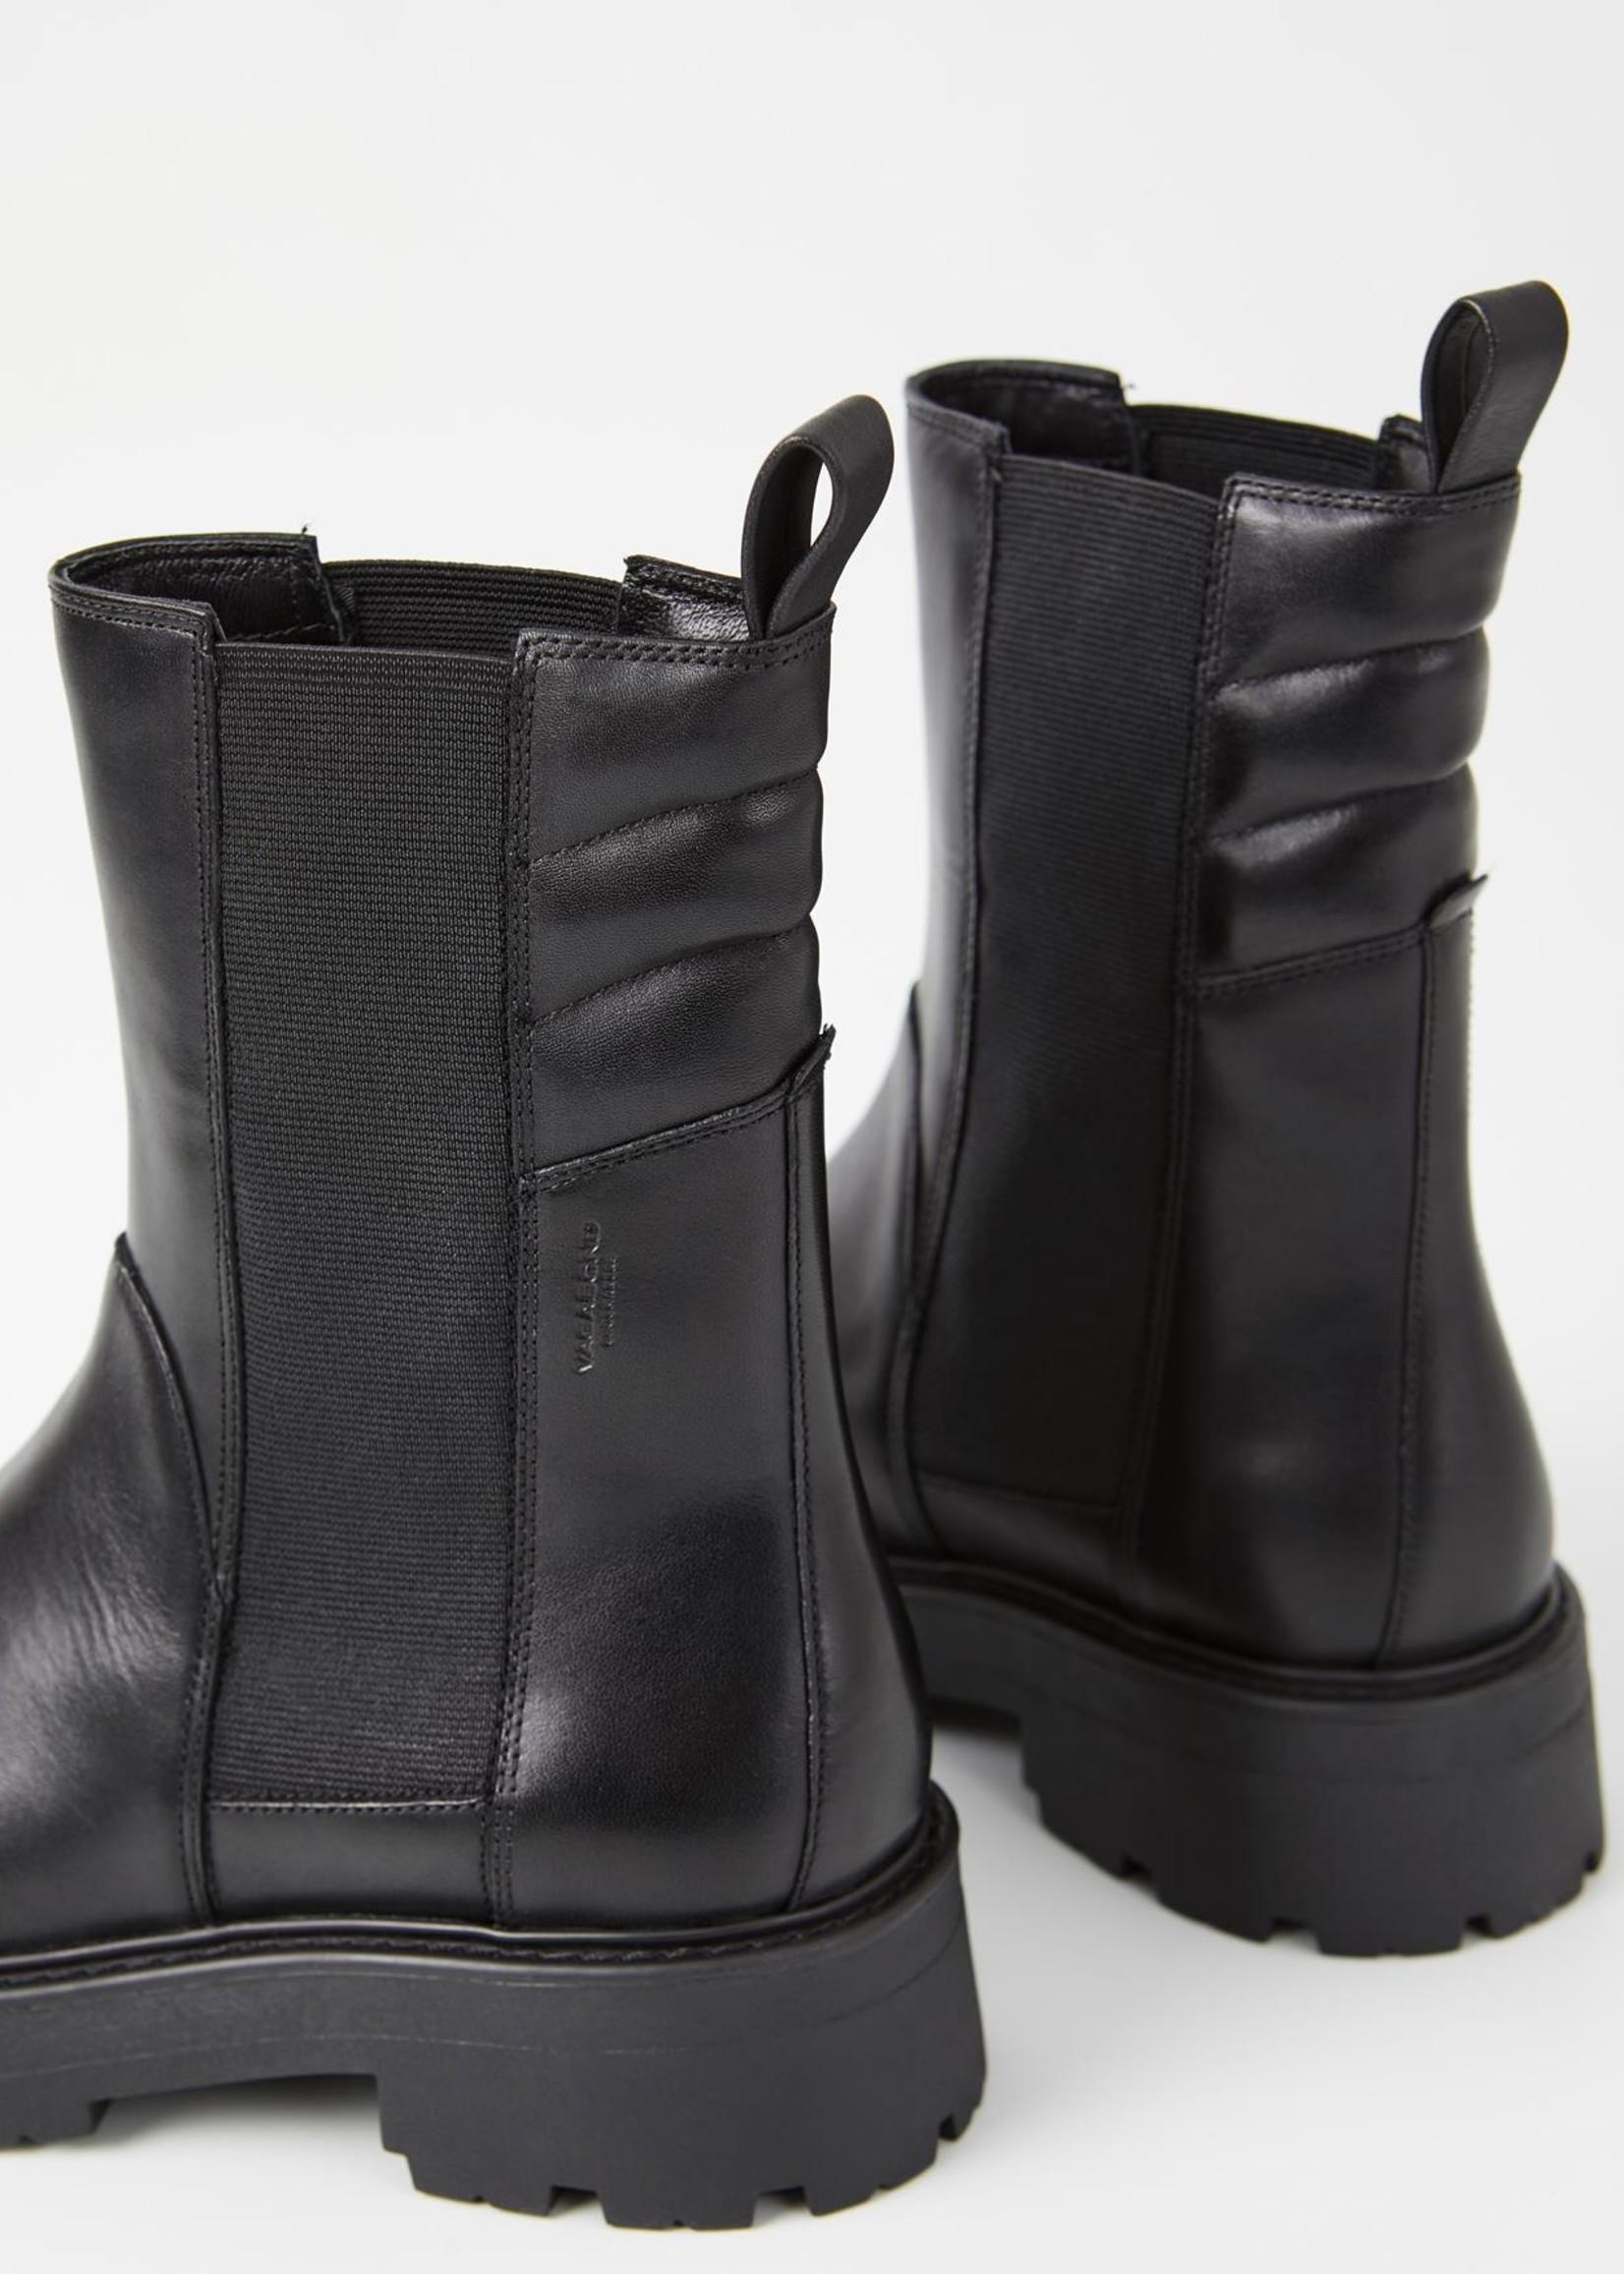 vagabond Cosmo 2.0 boots